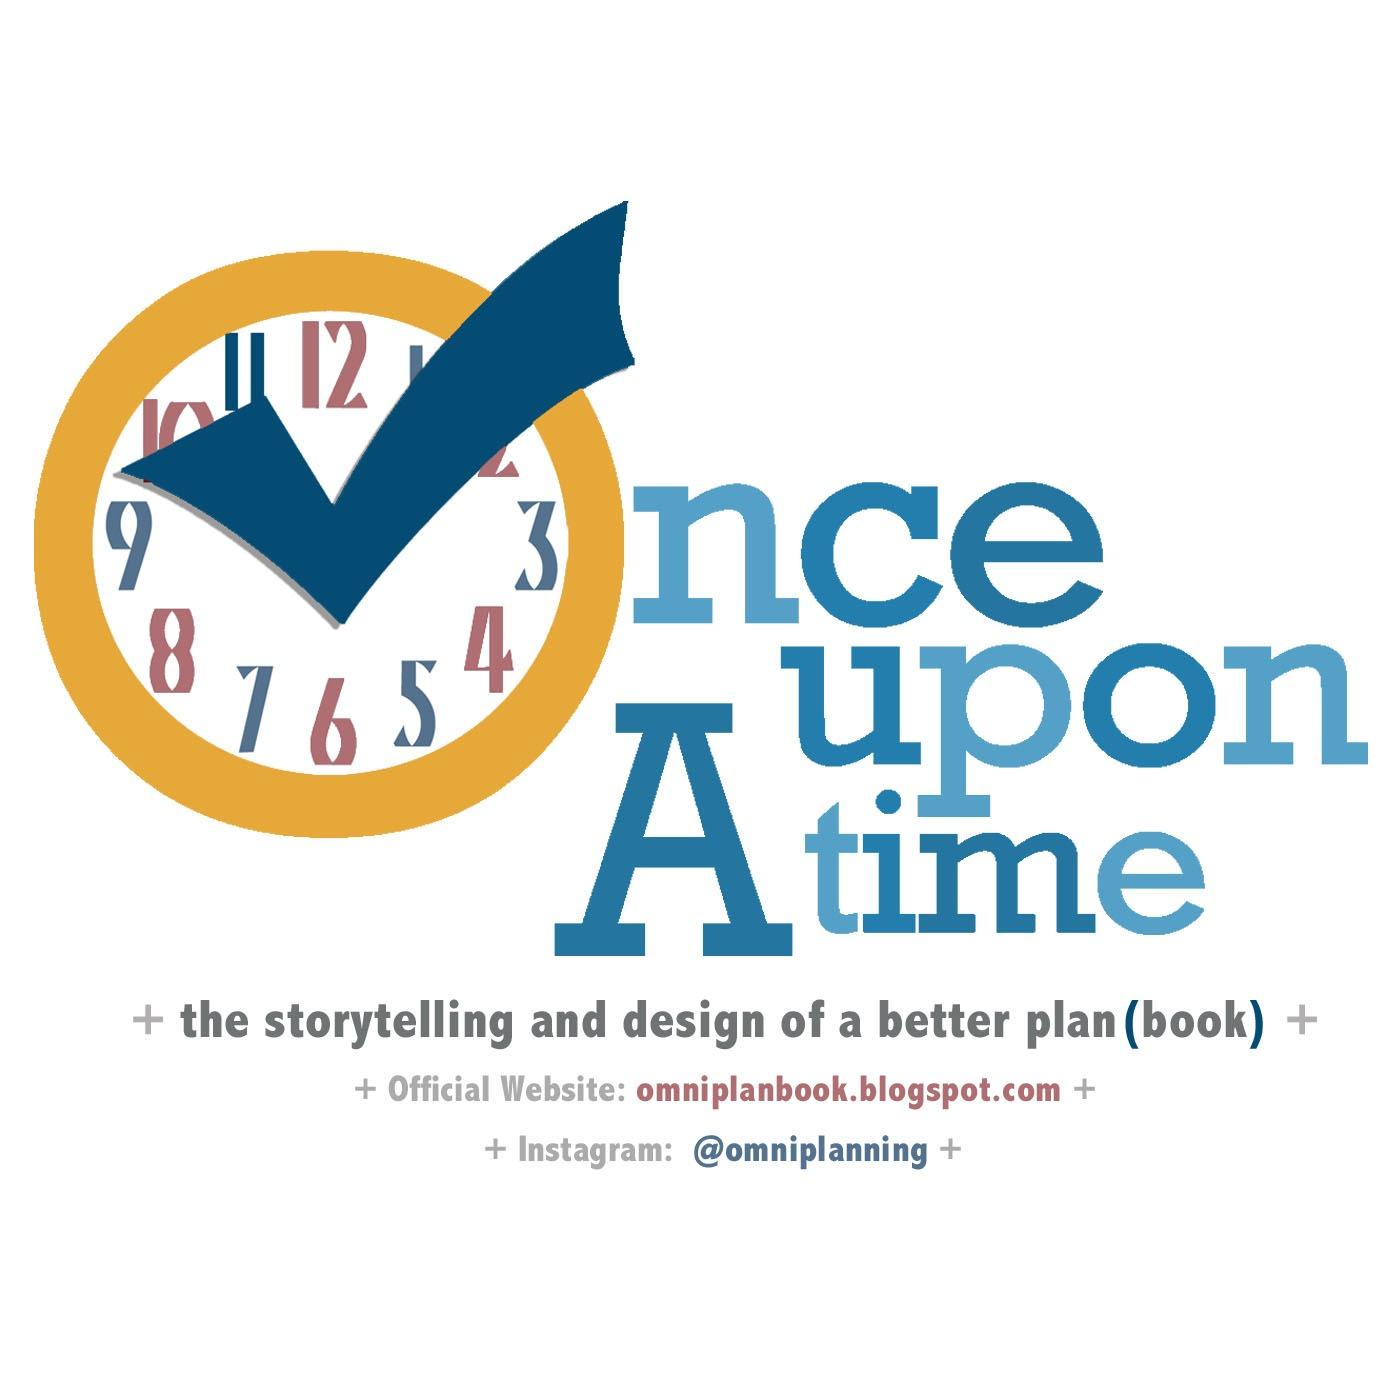 omniplanbook's Podcast